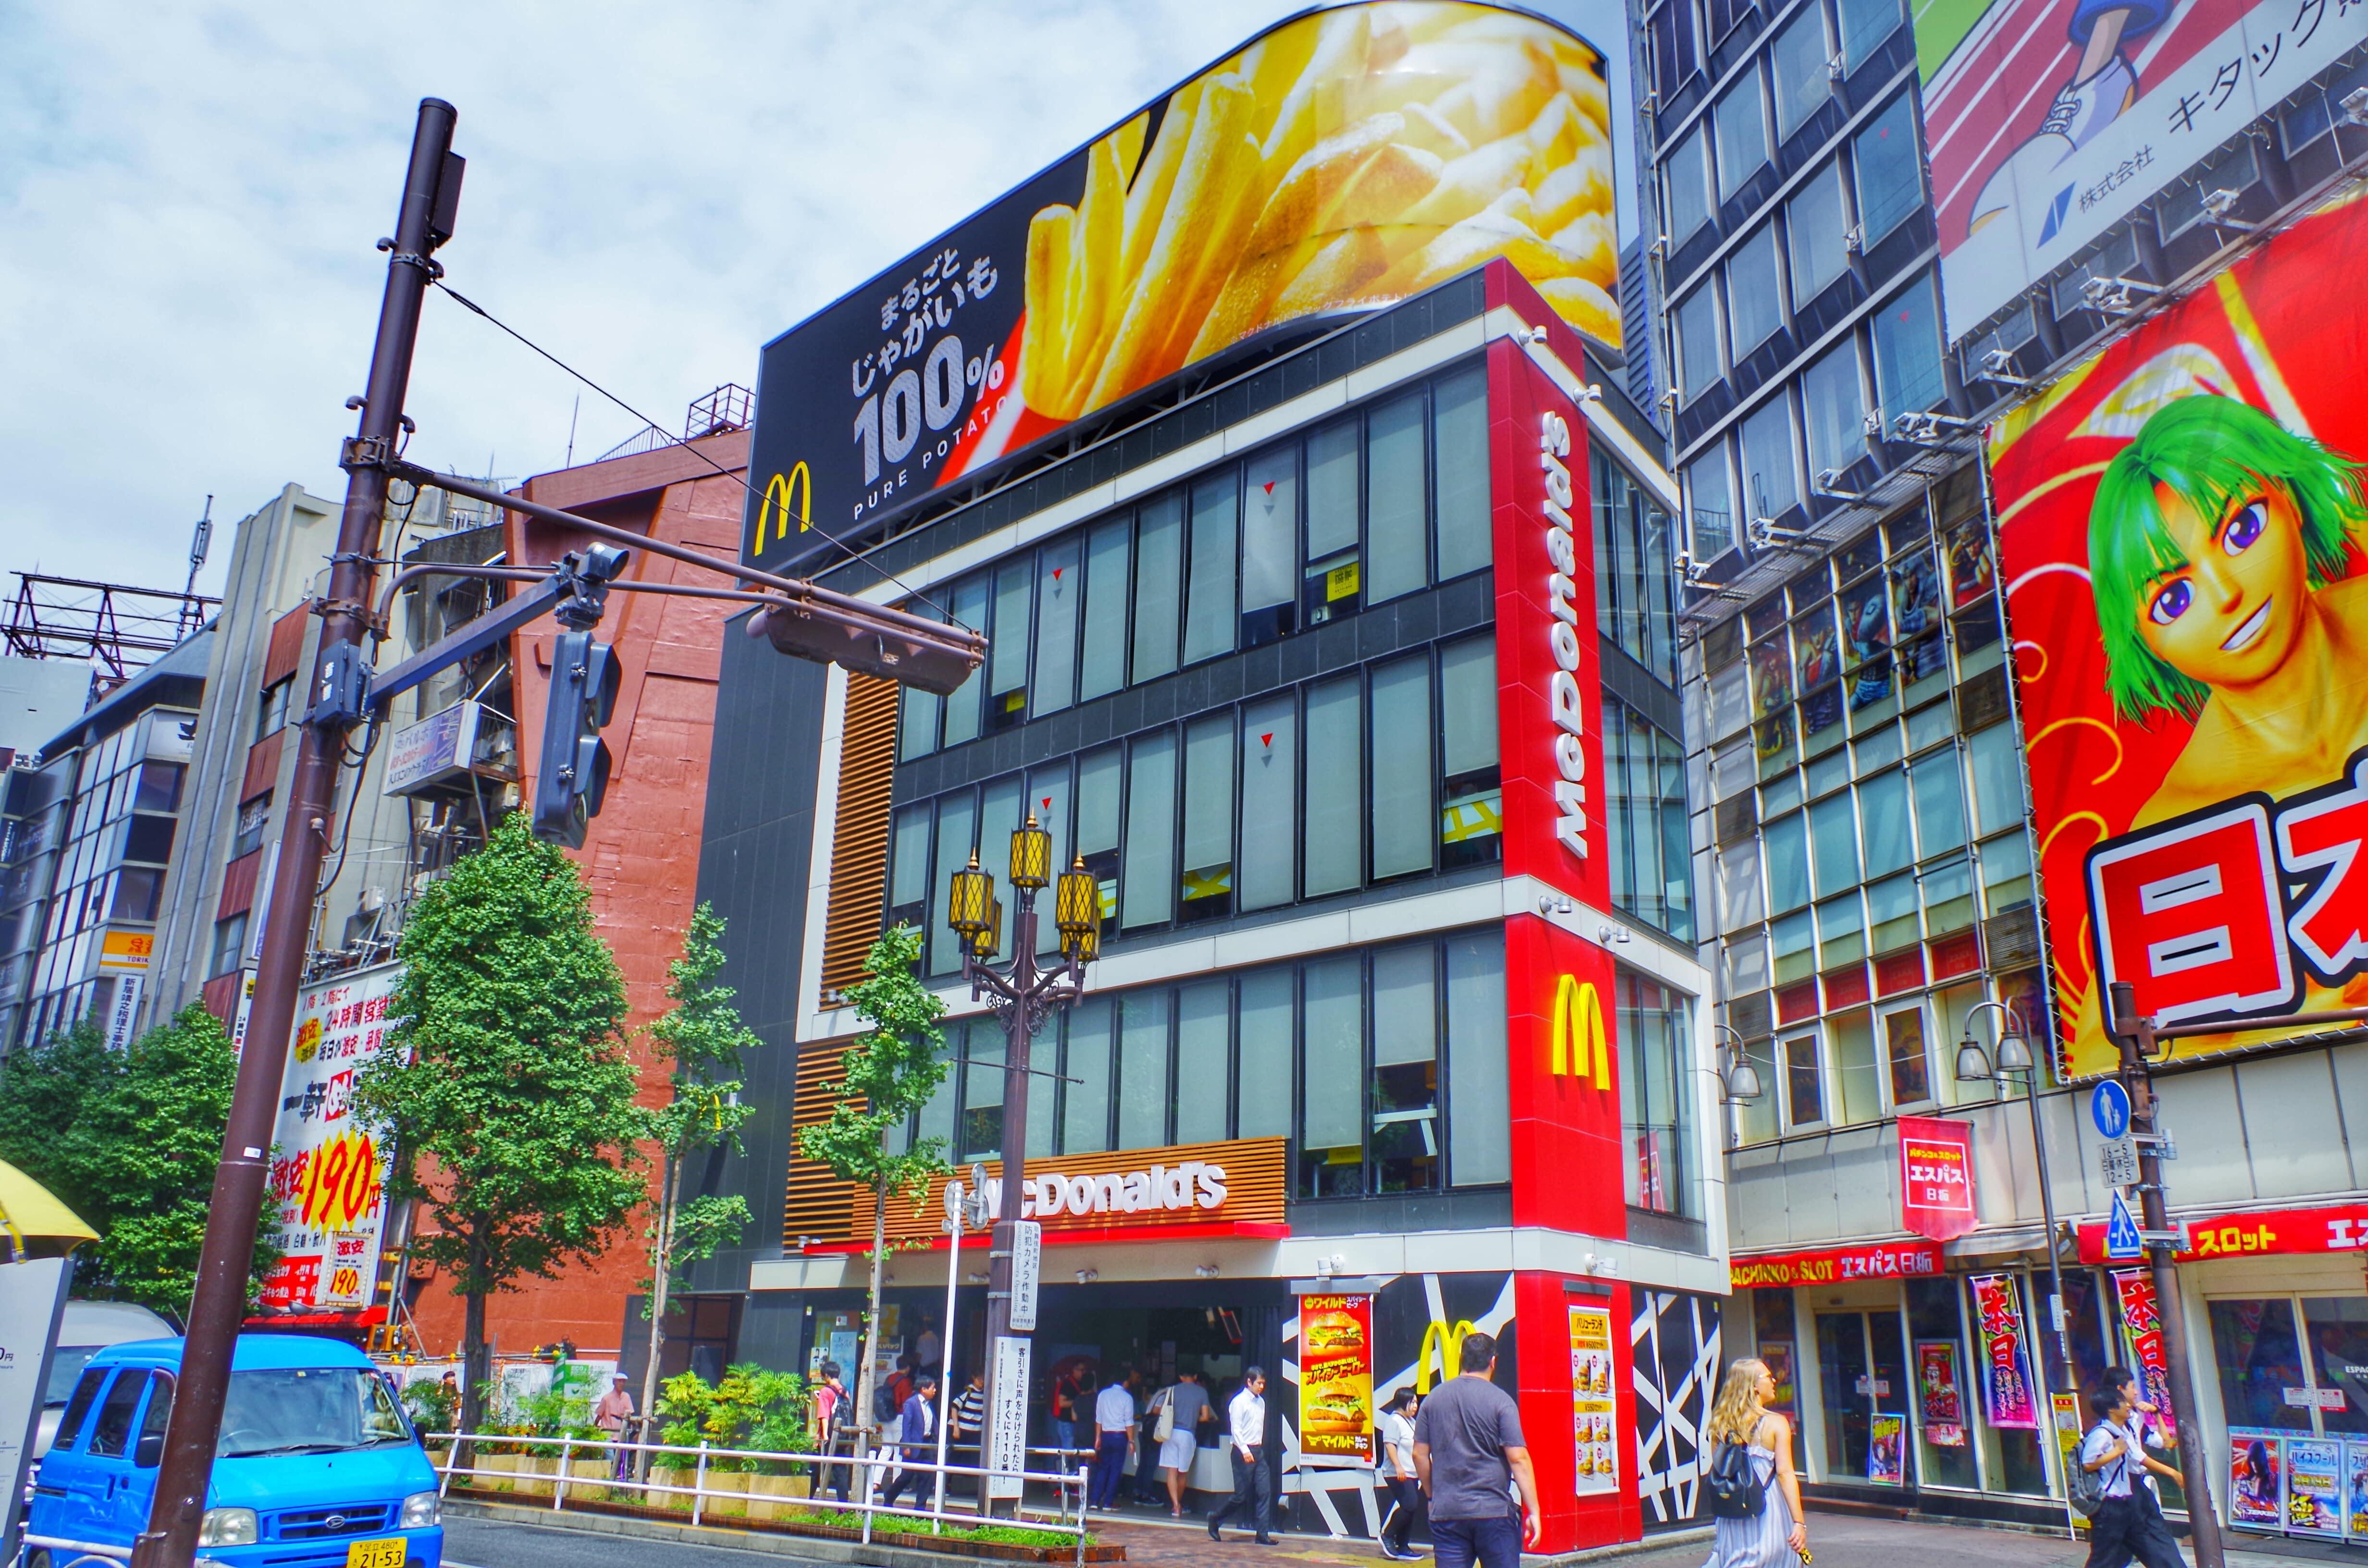 McDonald's Seibu Shinjuku Ekimae (マクドナルド西武新宿駅前店)